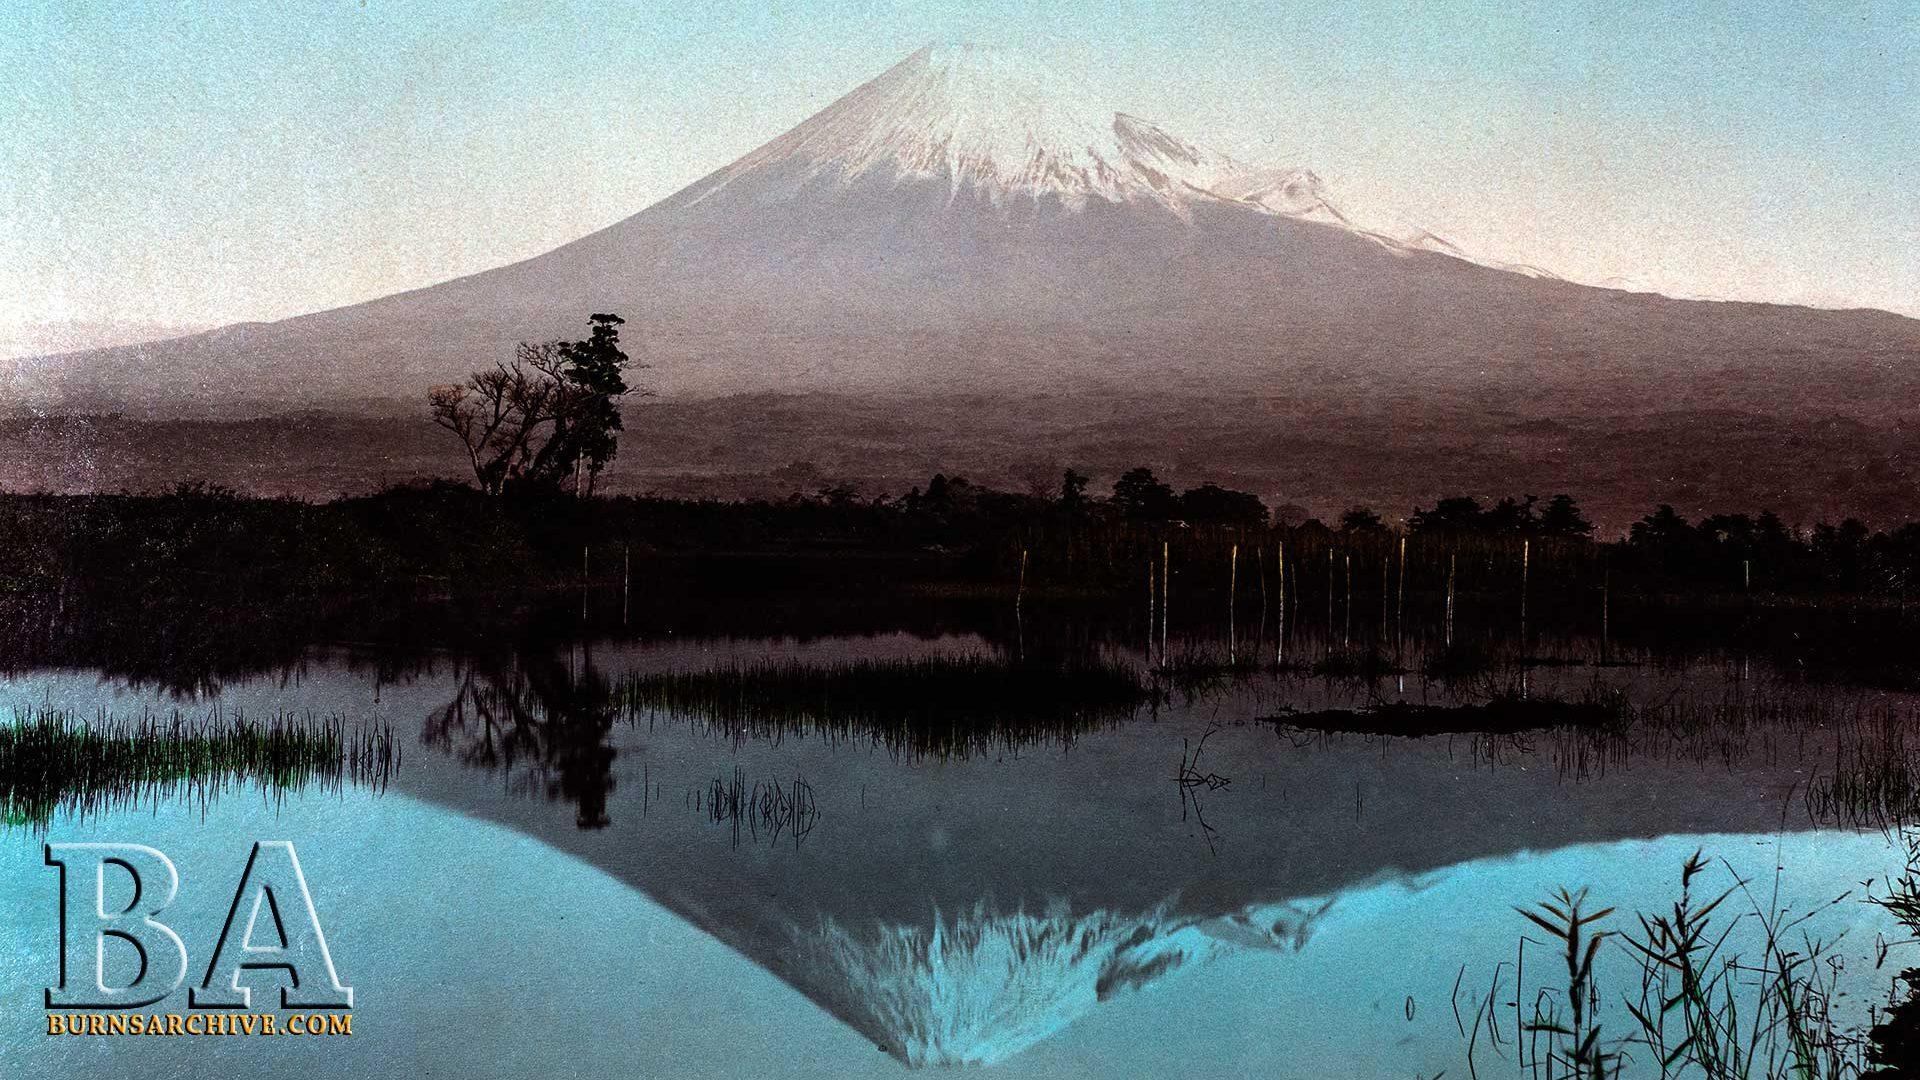 Fujisan Eternal Symbol Of Japan